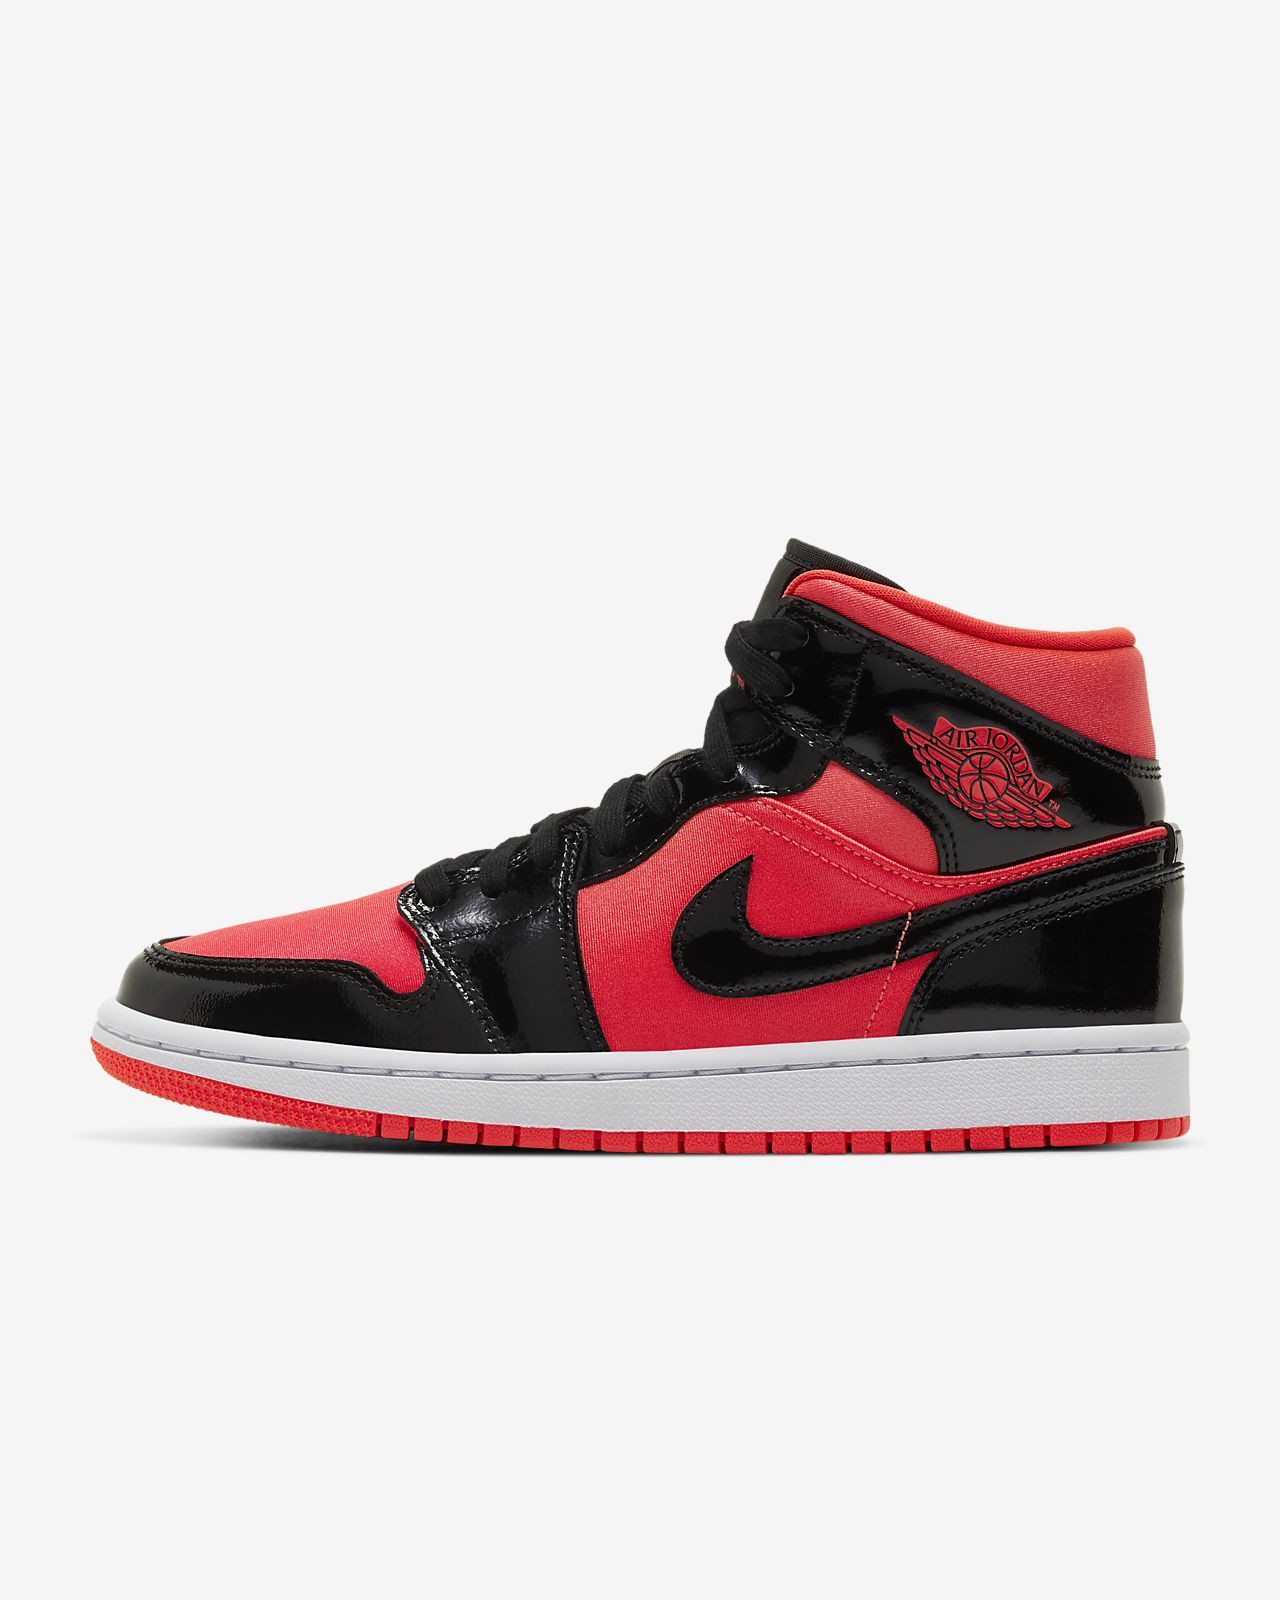 Herren Jordan Mid Top Schuhe. LU